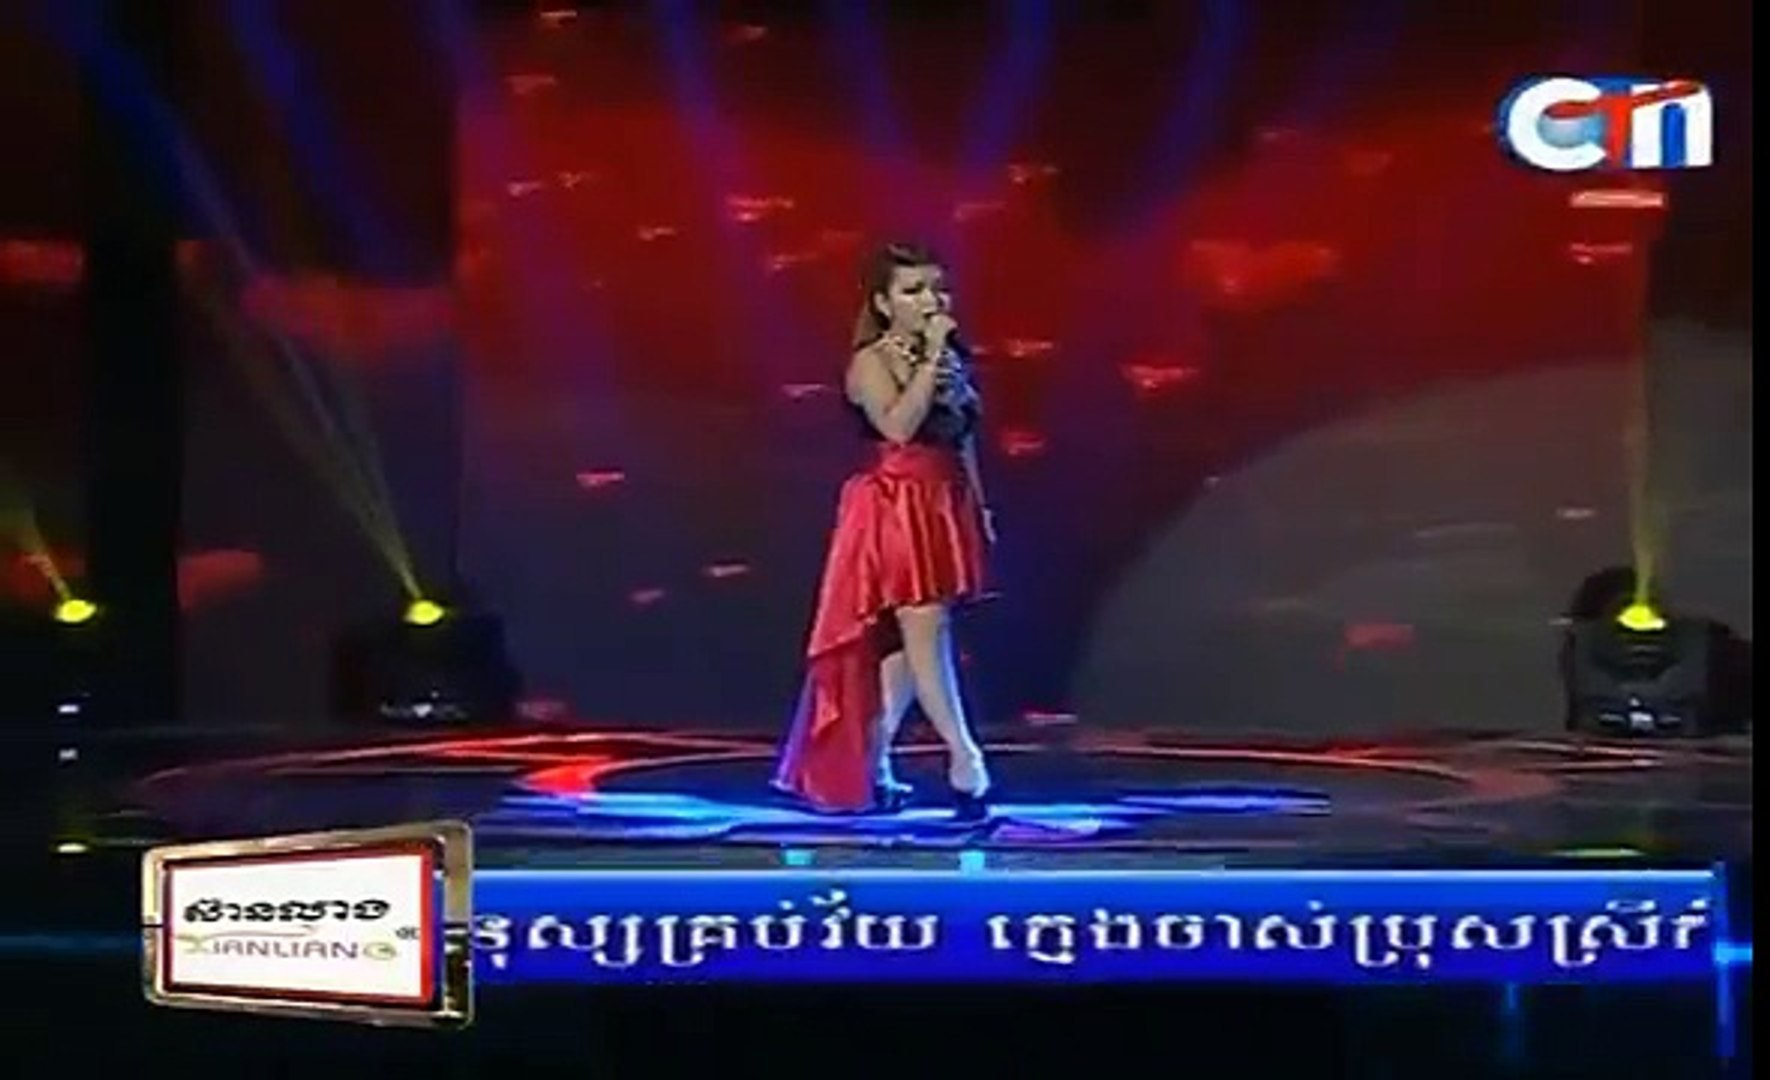 Khmer comedy 2015 | CTN Yung Chanyka Songs 11-Jan-2015 | Khmer comedy new This Week 2015